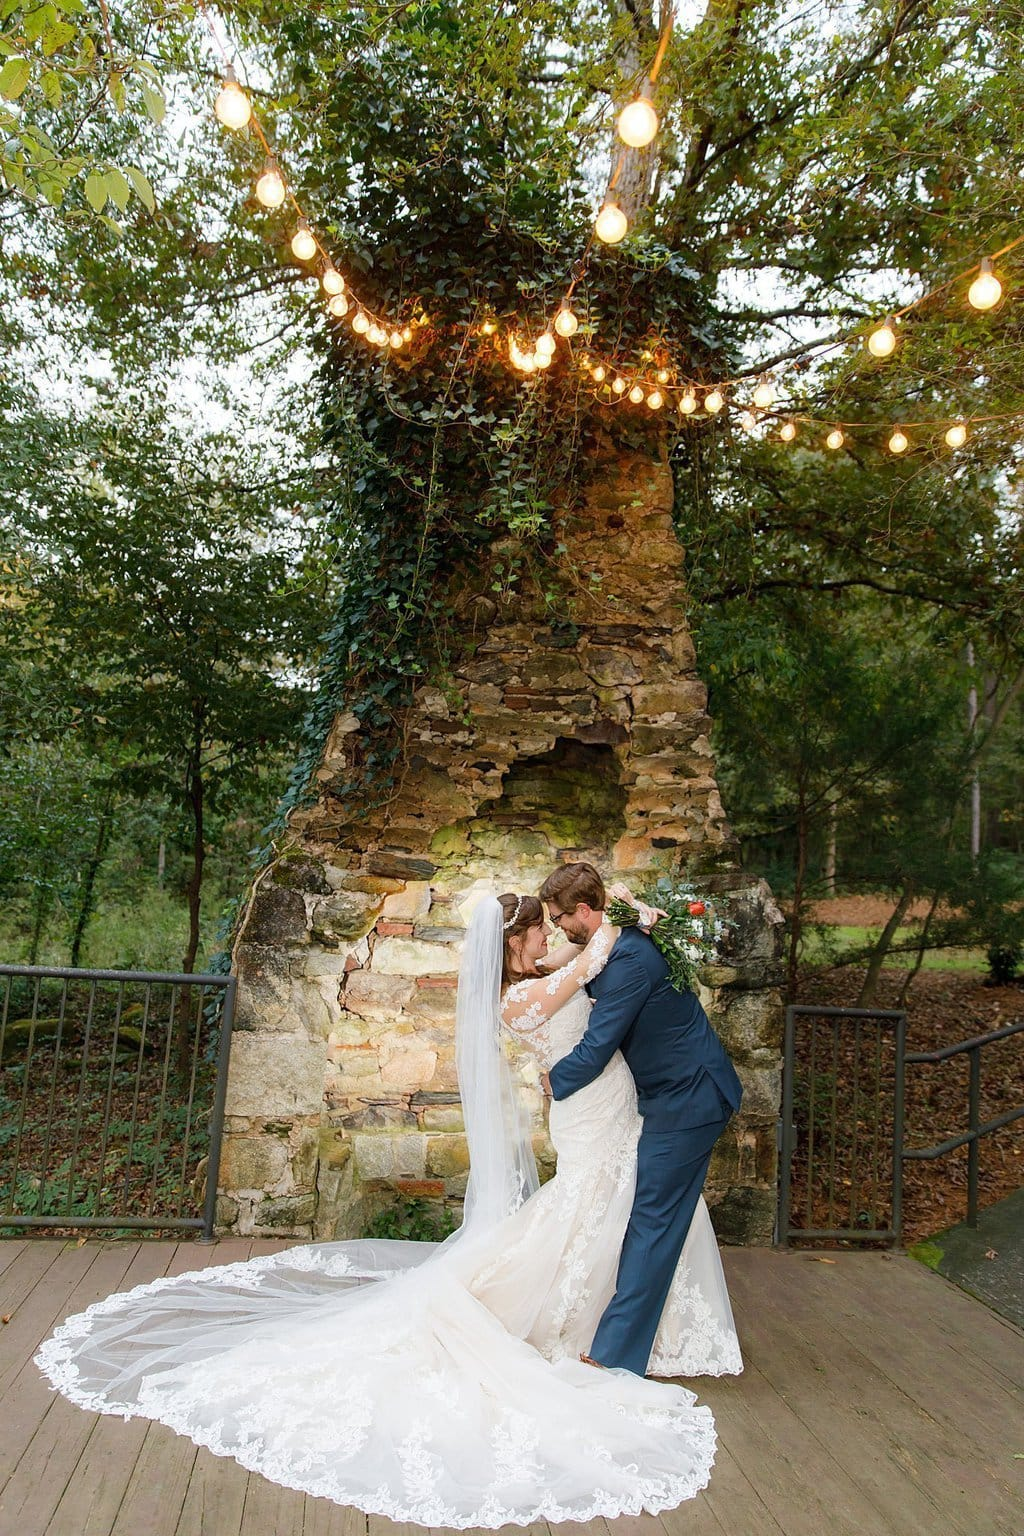 Bride and Groom by chimney ruins Bride in long sleeve gown Groom is dipping the Bride